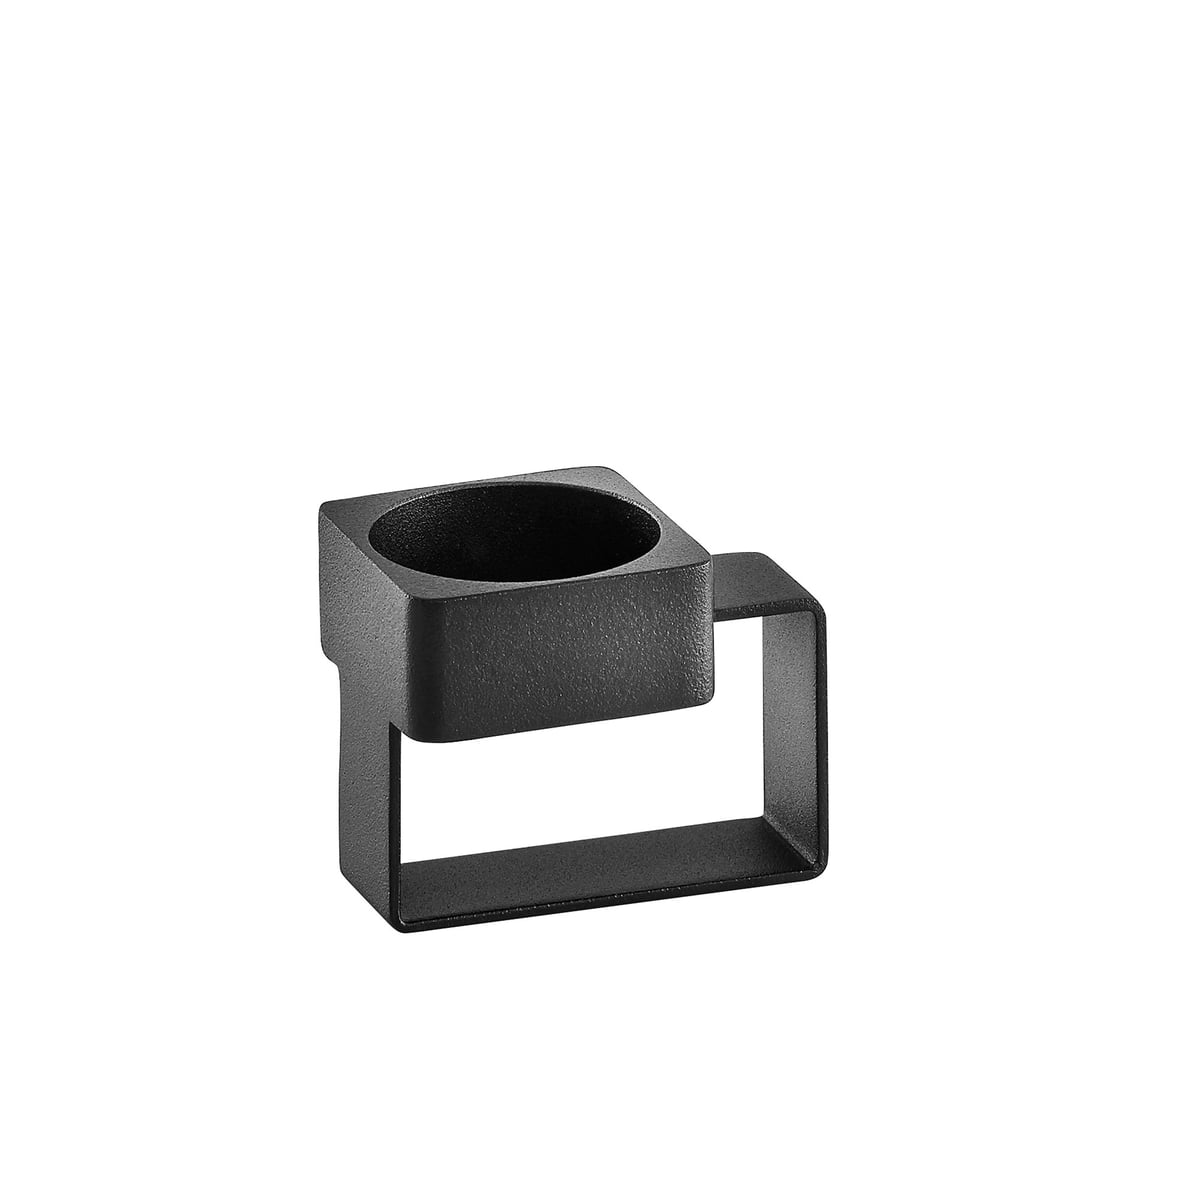 Woud - Tap Teelichthalter. schwarz | Dekoration > Kerzen und Kerzenständer | Schwarz | Metall -  lackiert | Woud